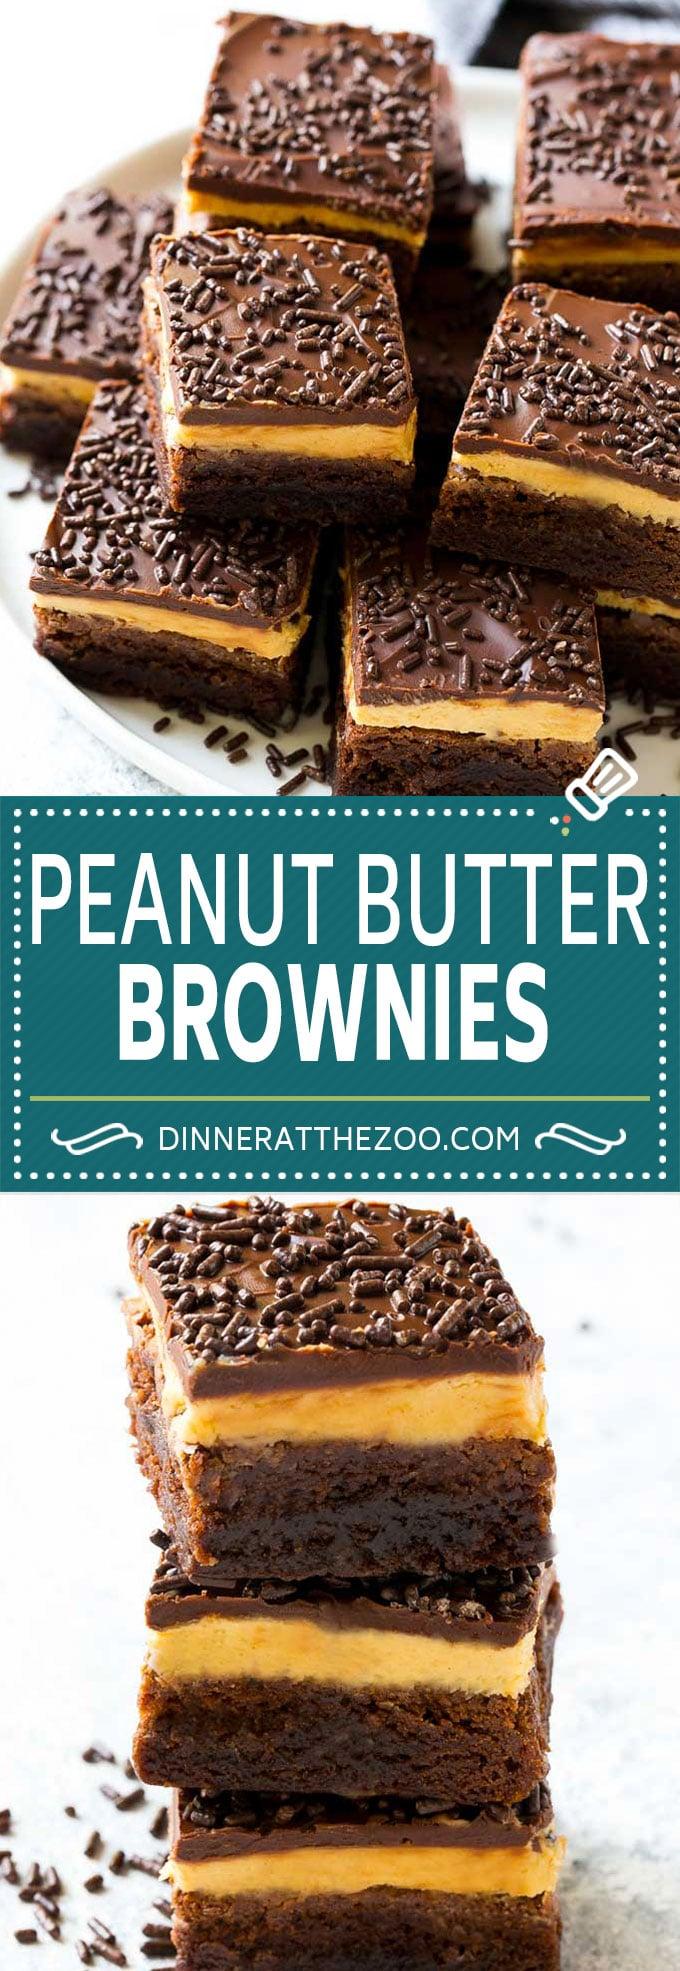 Peanut Butter Brownies Recipe | Layered Brownies | Peanut Butter Truffle Brownies #chocolate #peanutbutter #brownies #dessert #dinneratthezoo